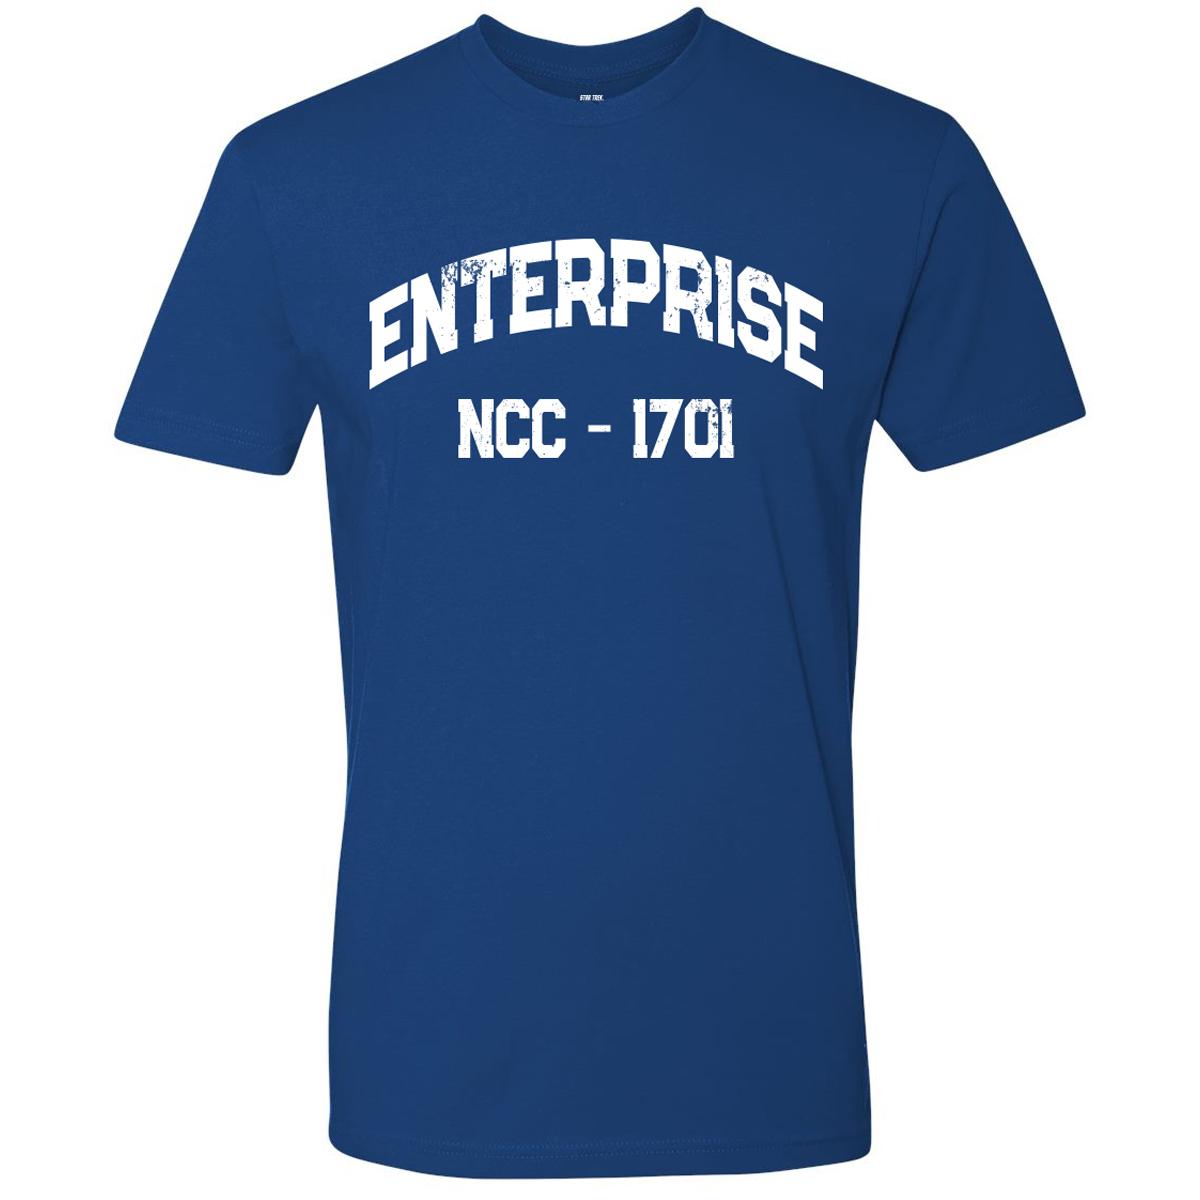 Star Trek Distressed Enterprise T-Shirt